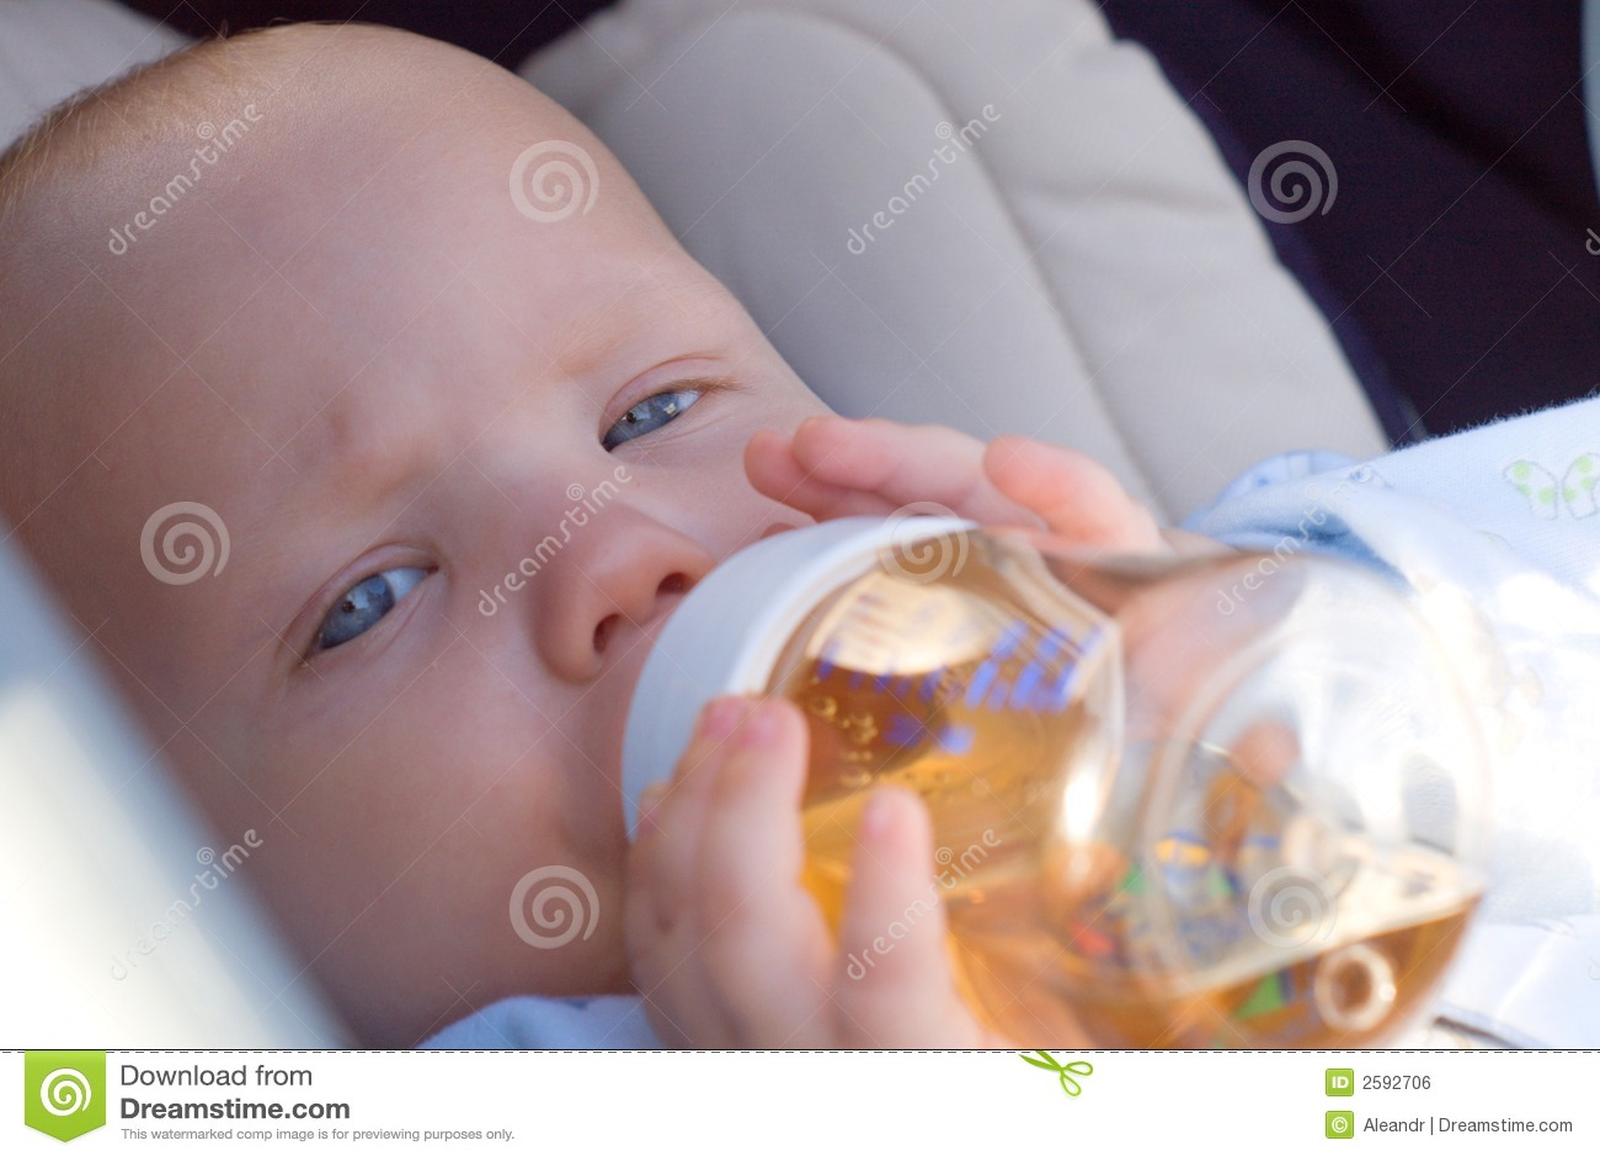 Baby Drinking Tea Royalty Free Stock Image - Image: 2592706